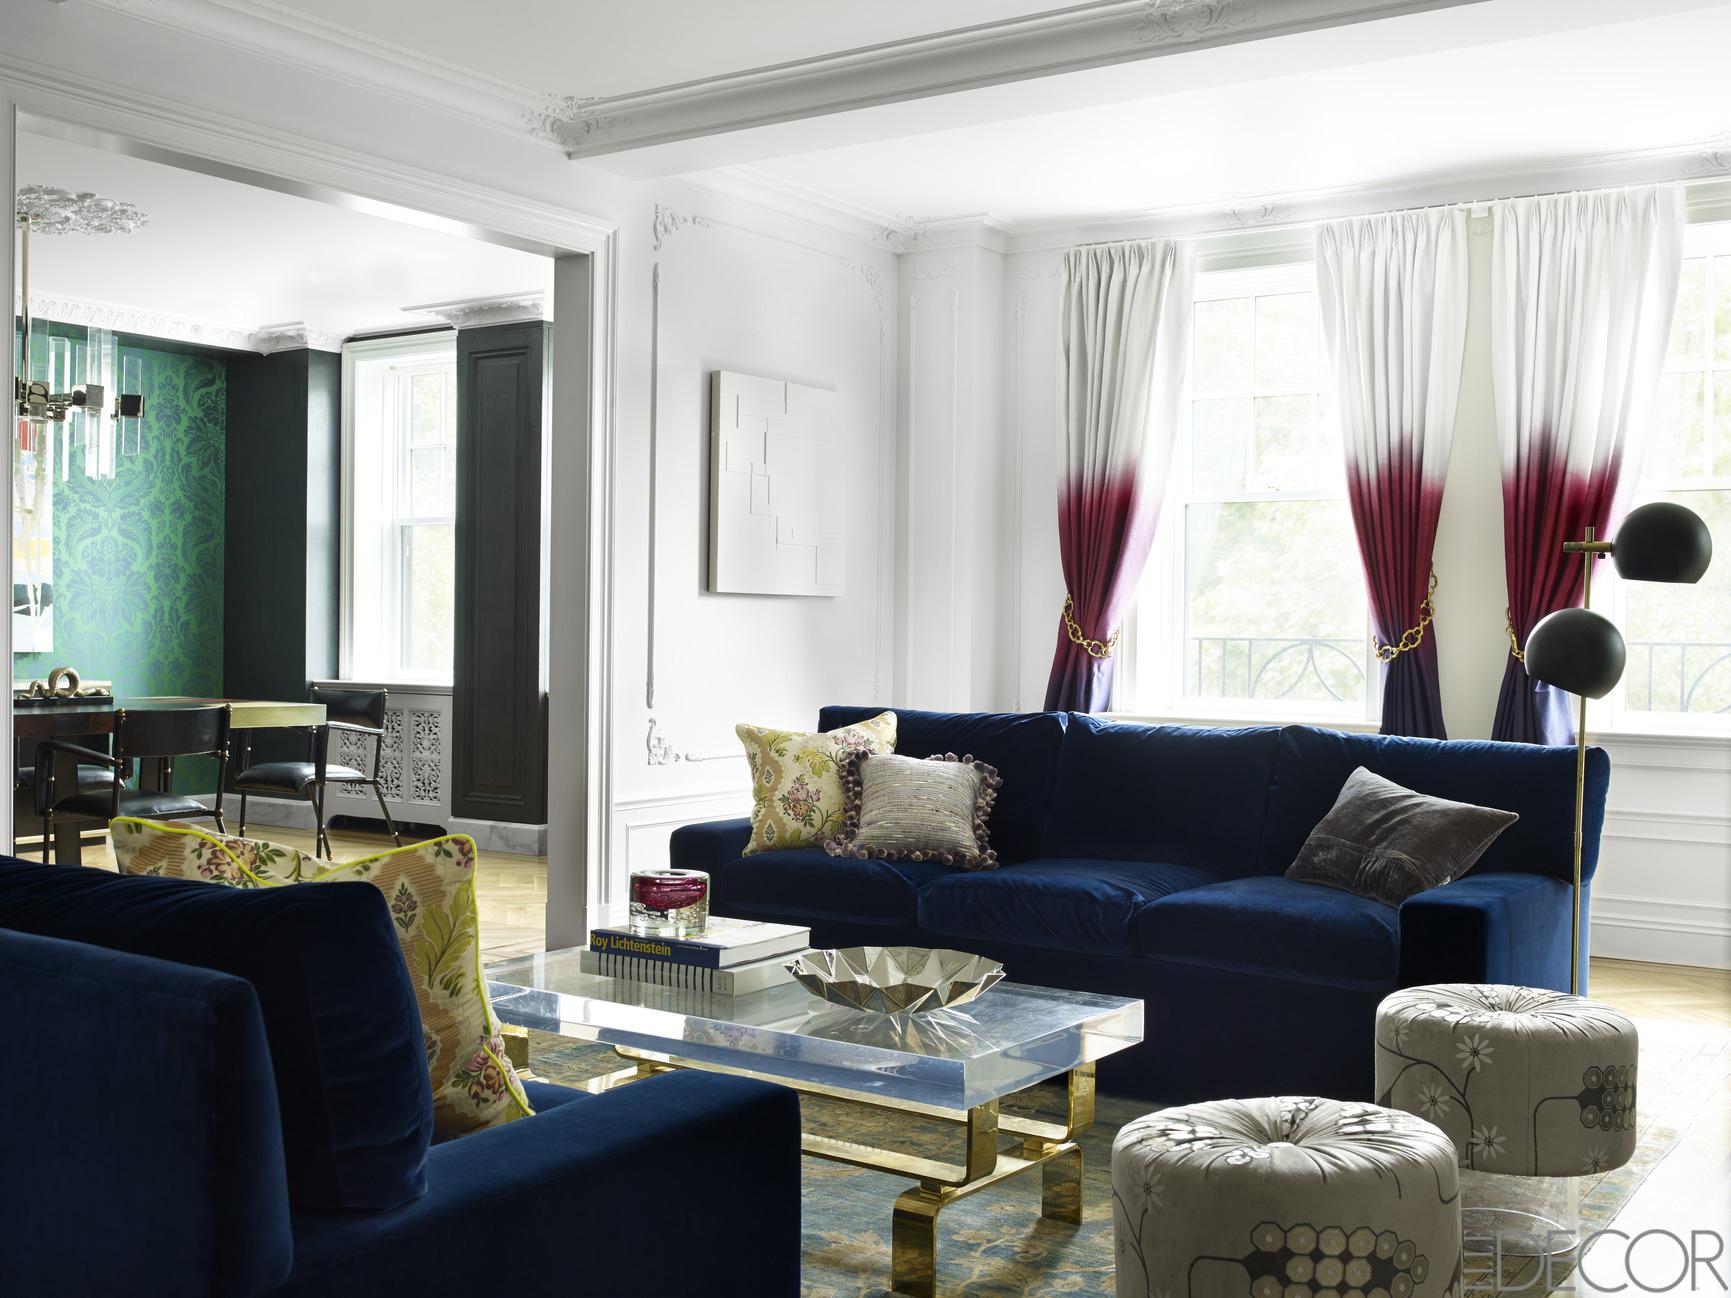 Best 30 Living Room Curtains Ideas - Window Drapes for Living Rooms living room curtain ideas modern